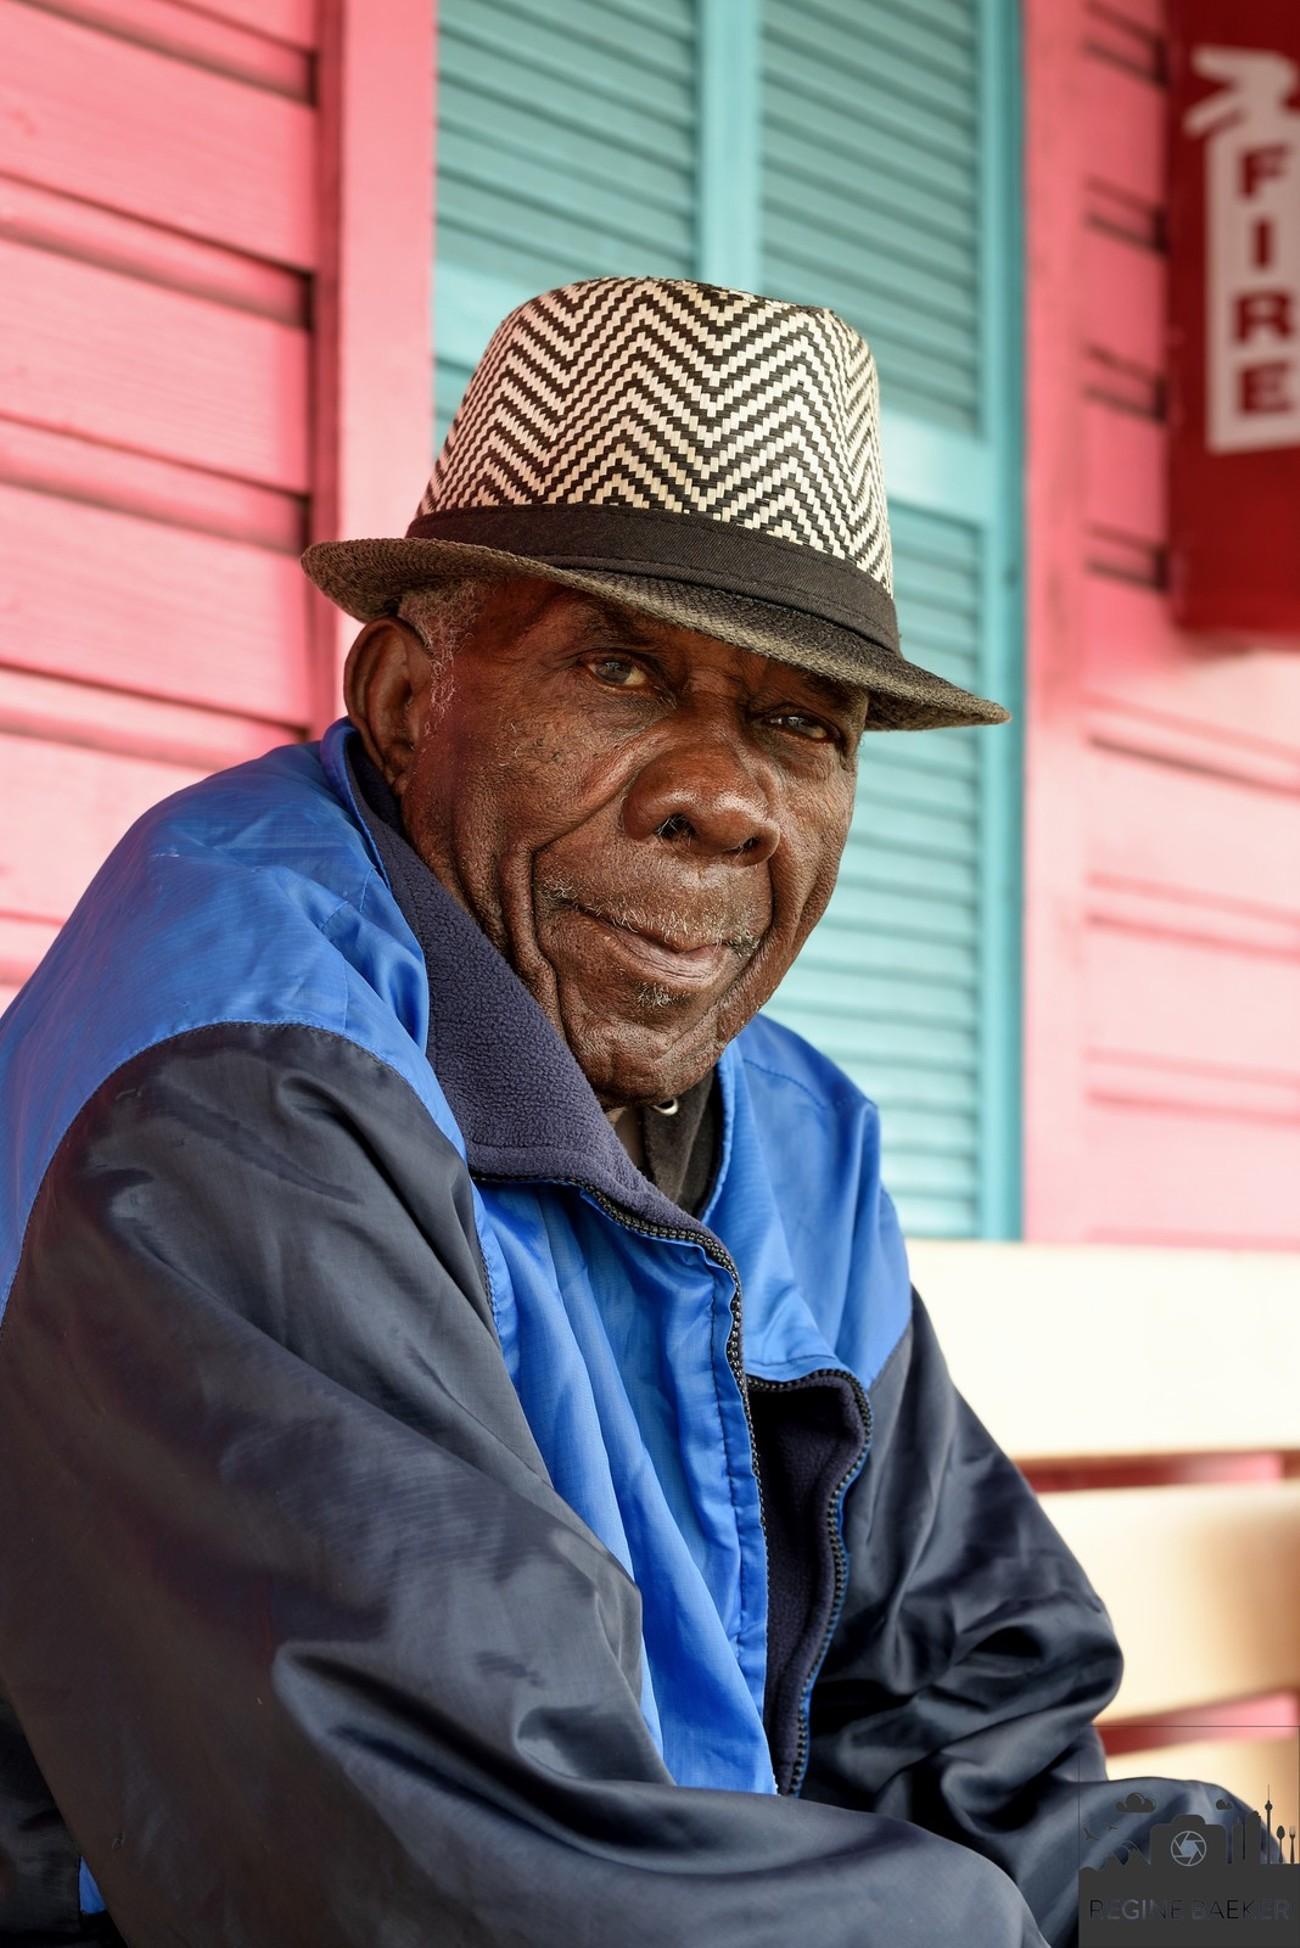 This wonderful old man I met at the Bahamas Islands